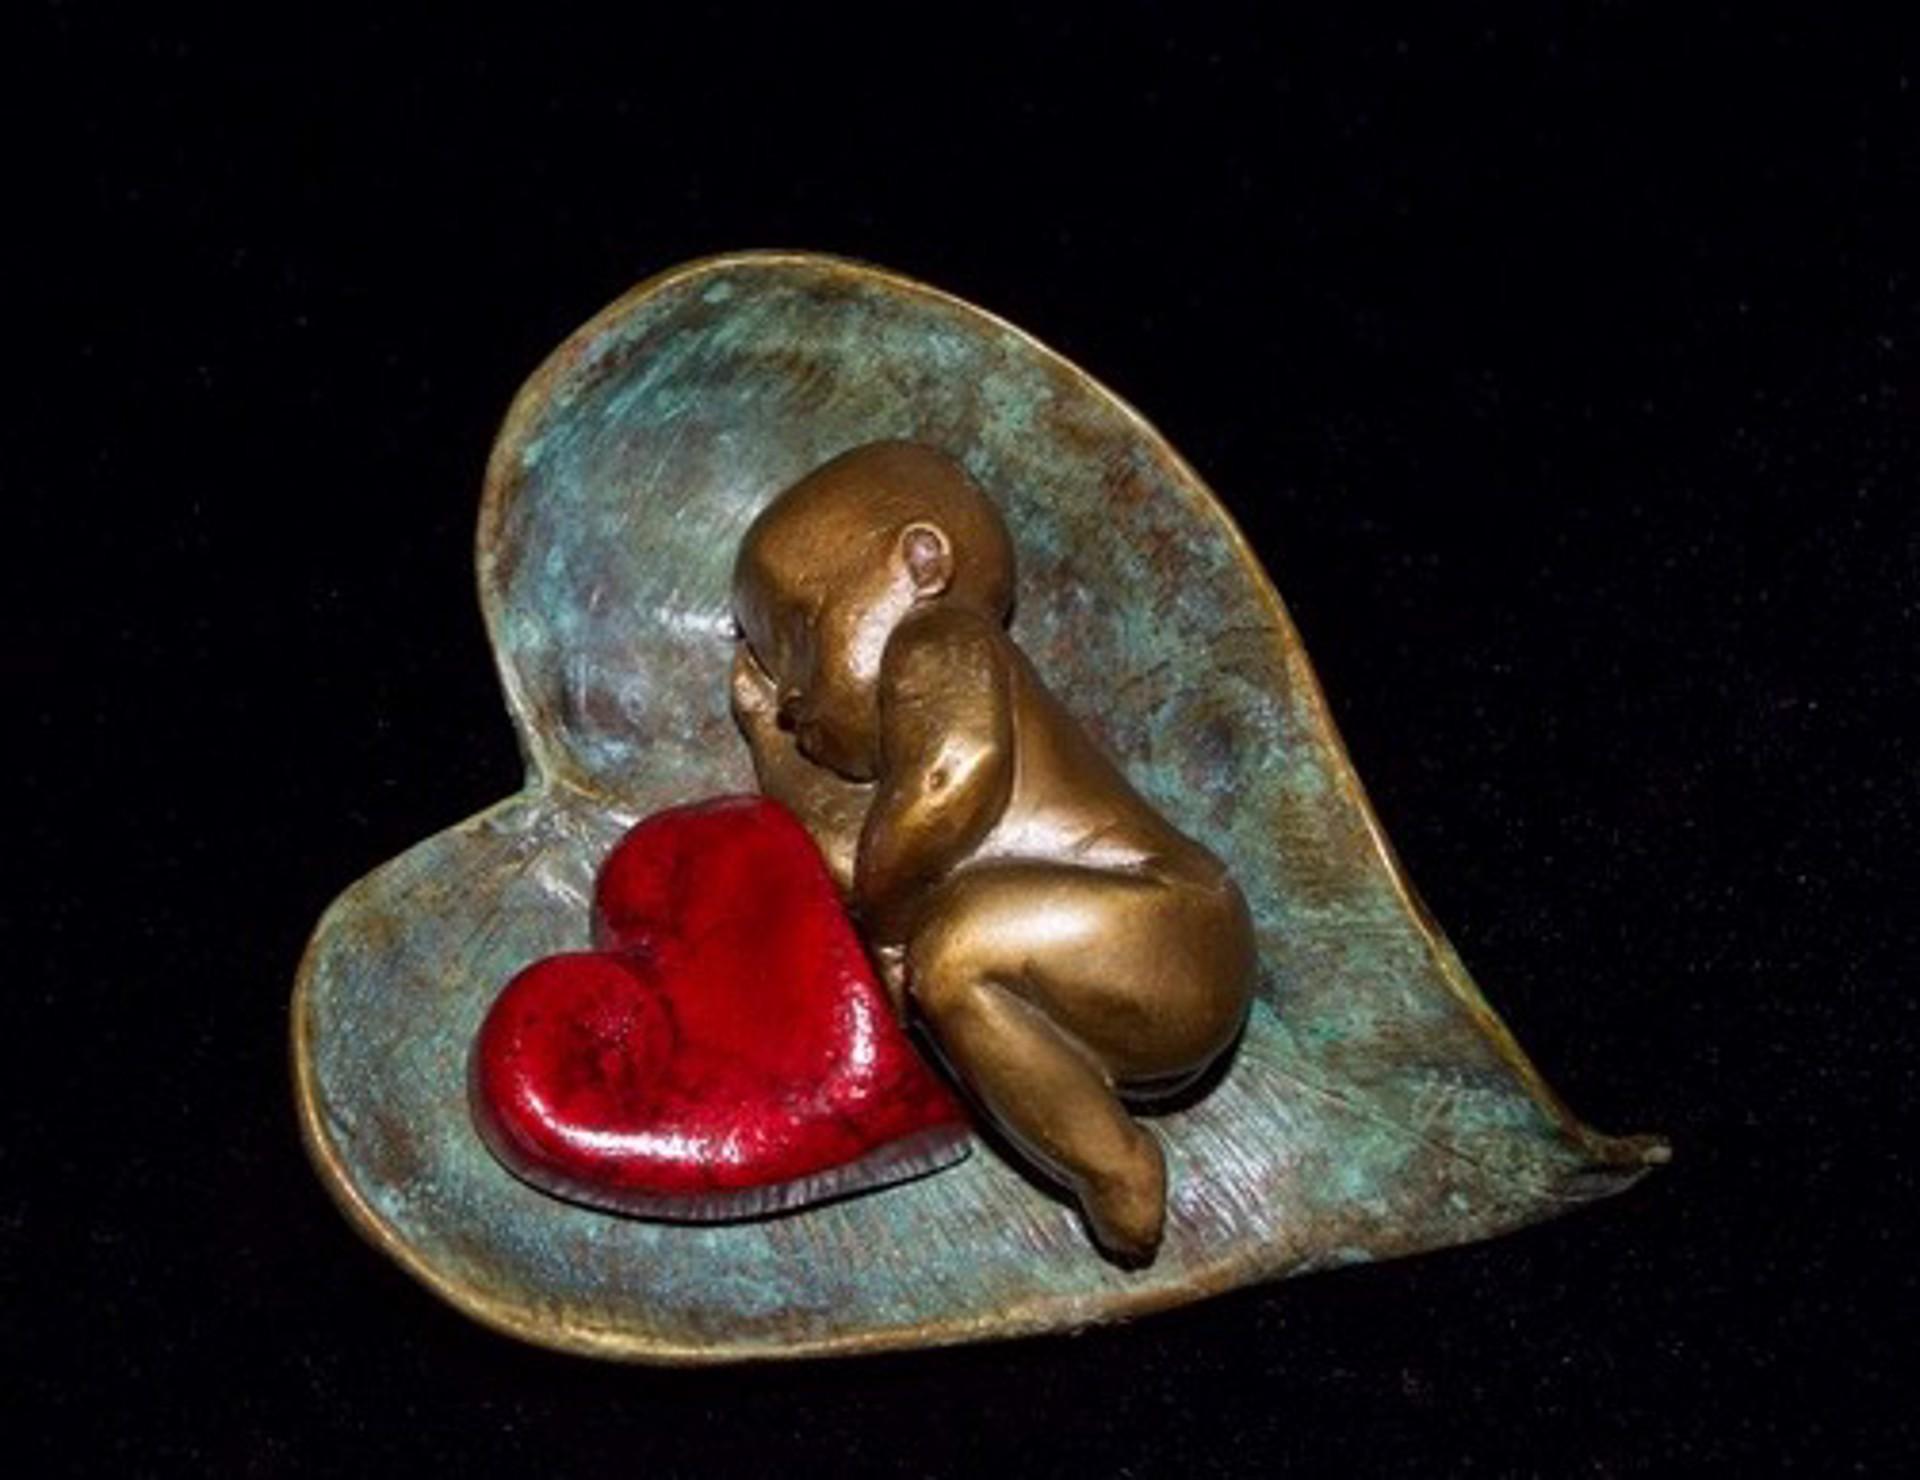 Have a Heart (Christine Turnbull) by Steve Turnbull